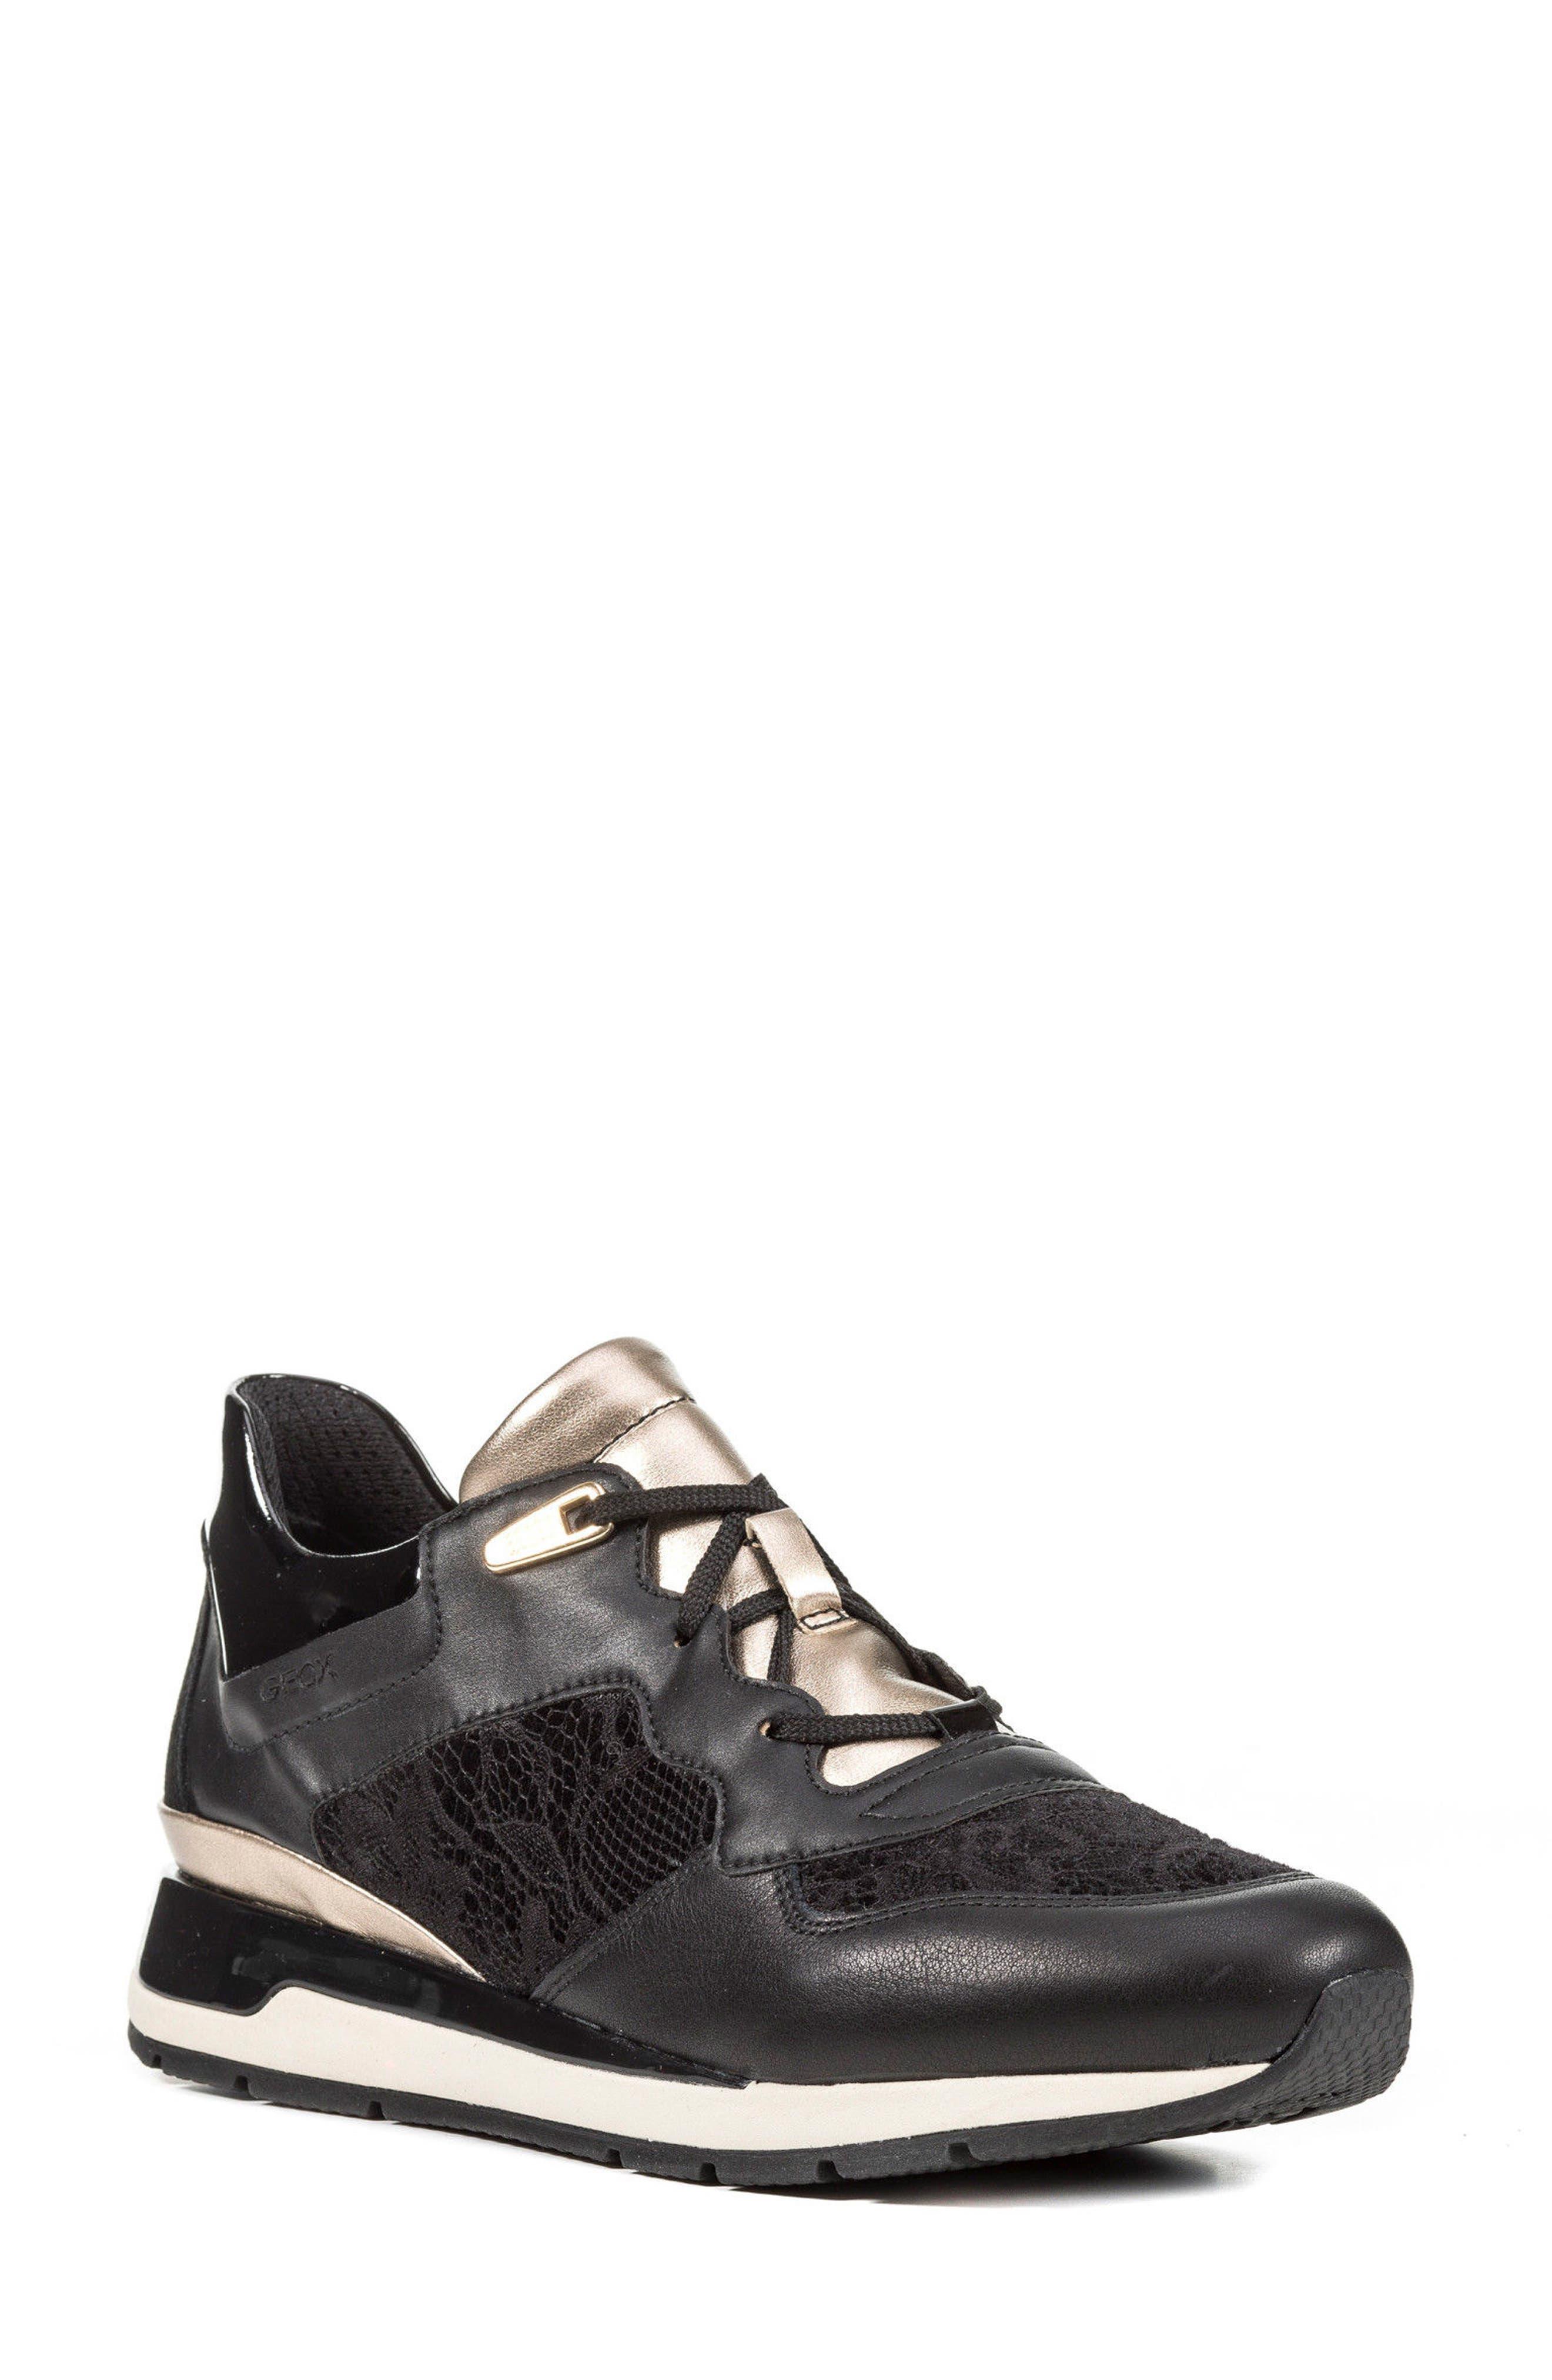 Shahira Sneaker,                         Main,                         color, 001